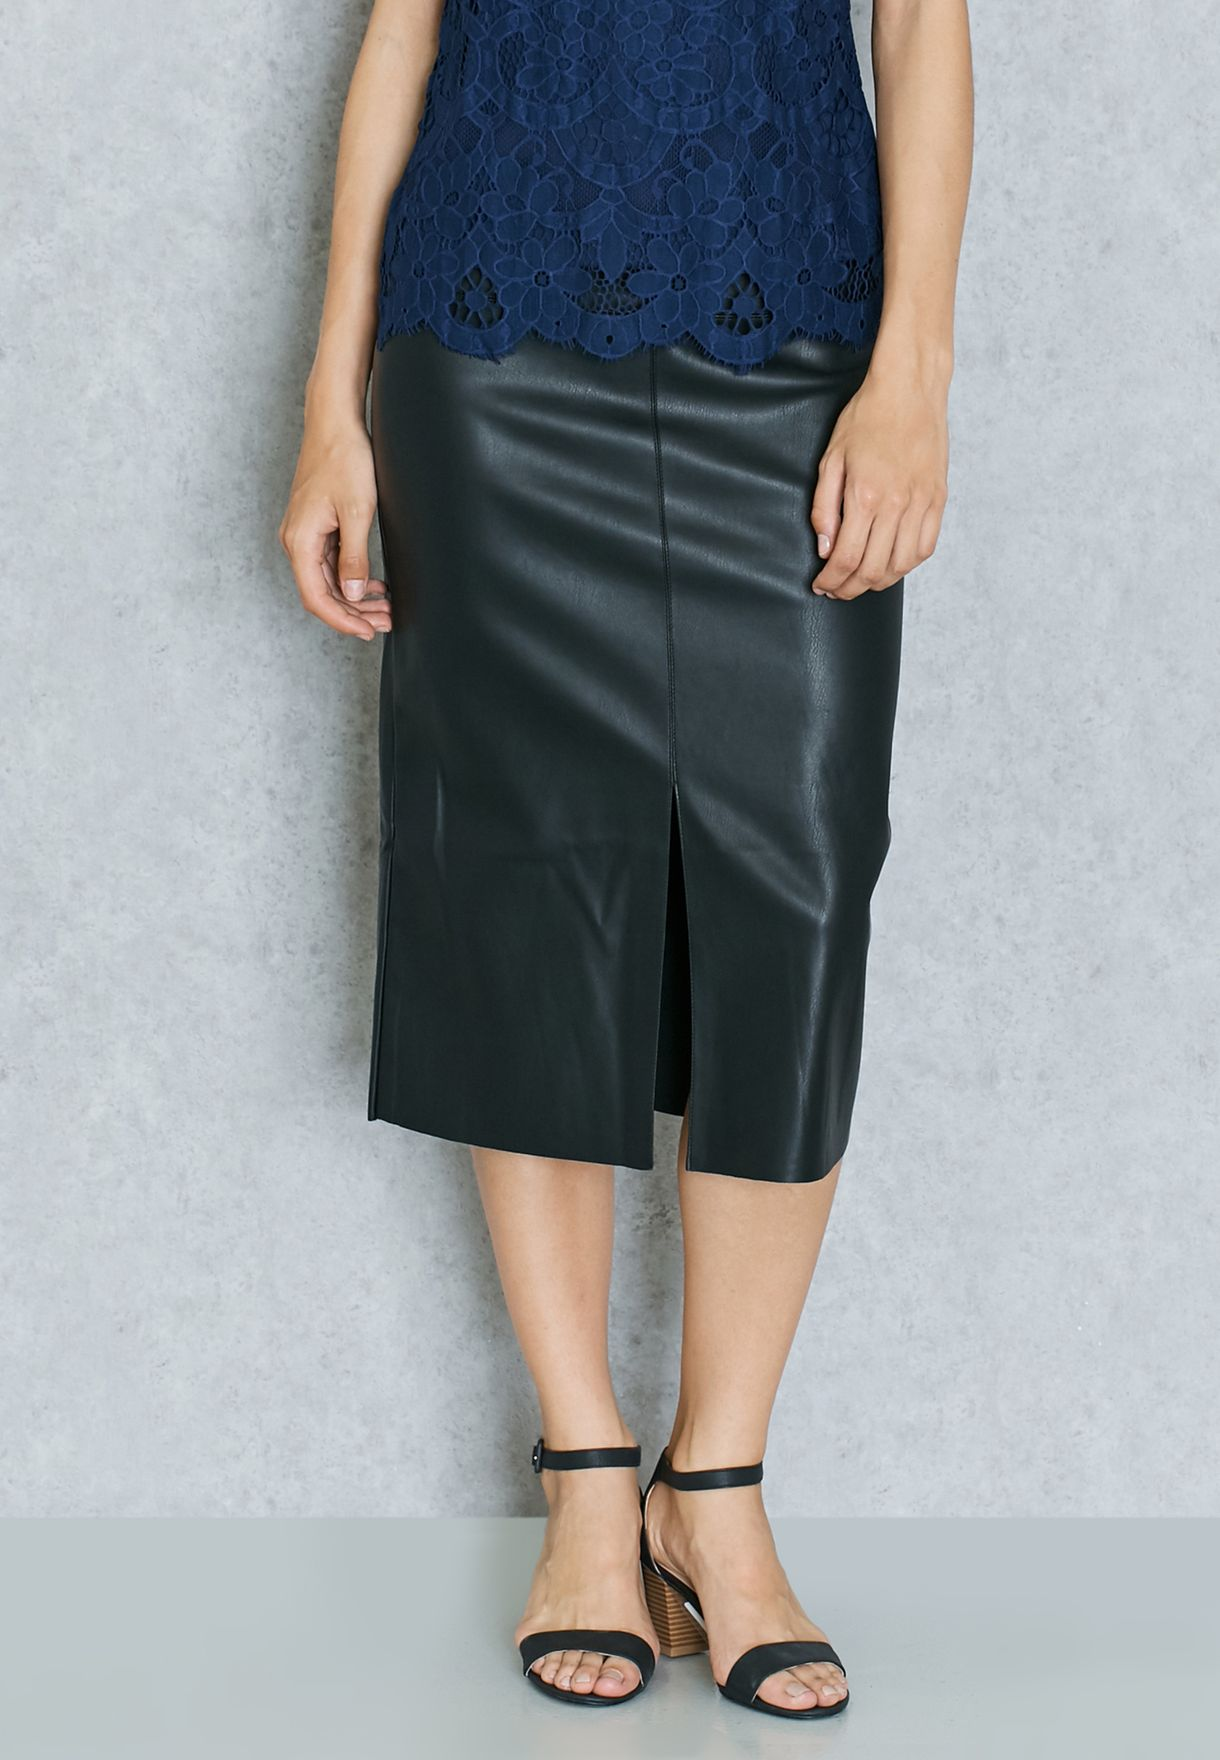 4567c8e43 Shop Dorothy Perkins black Front Split PU Pencil Skirt 14732010 for ...